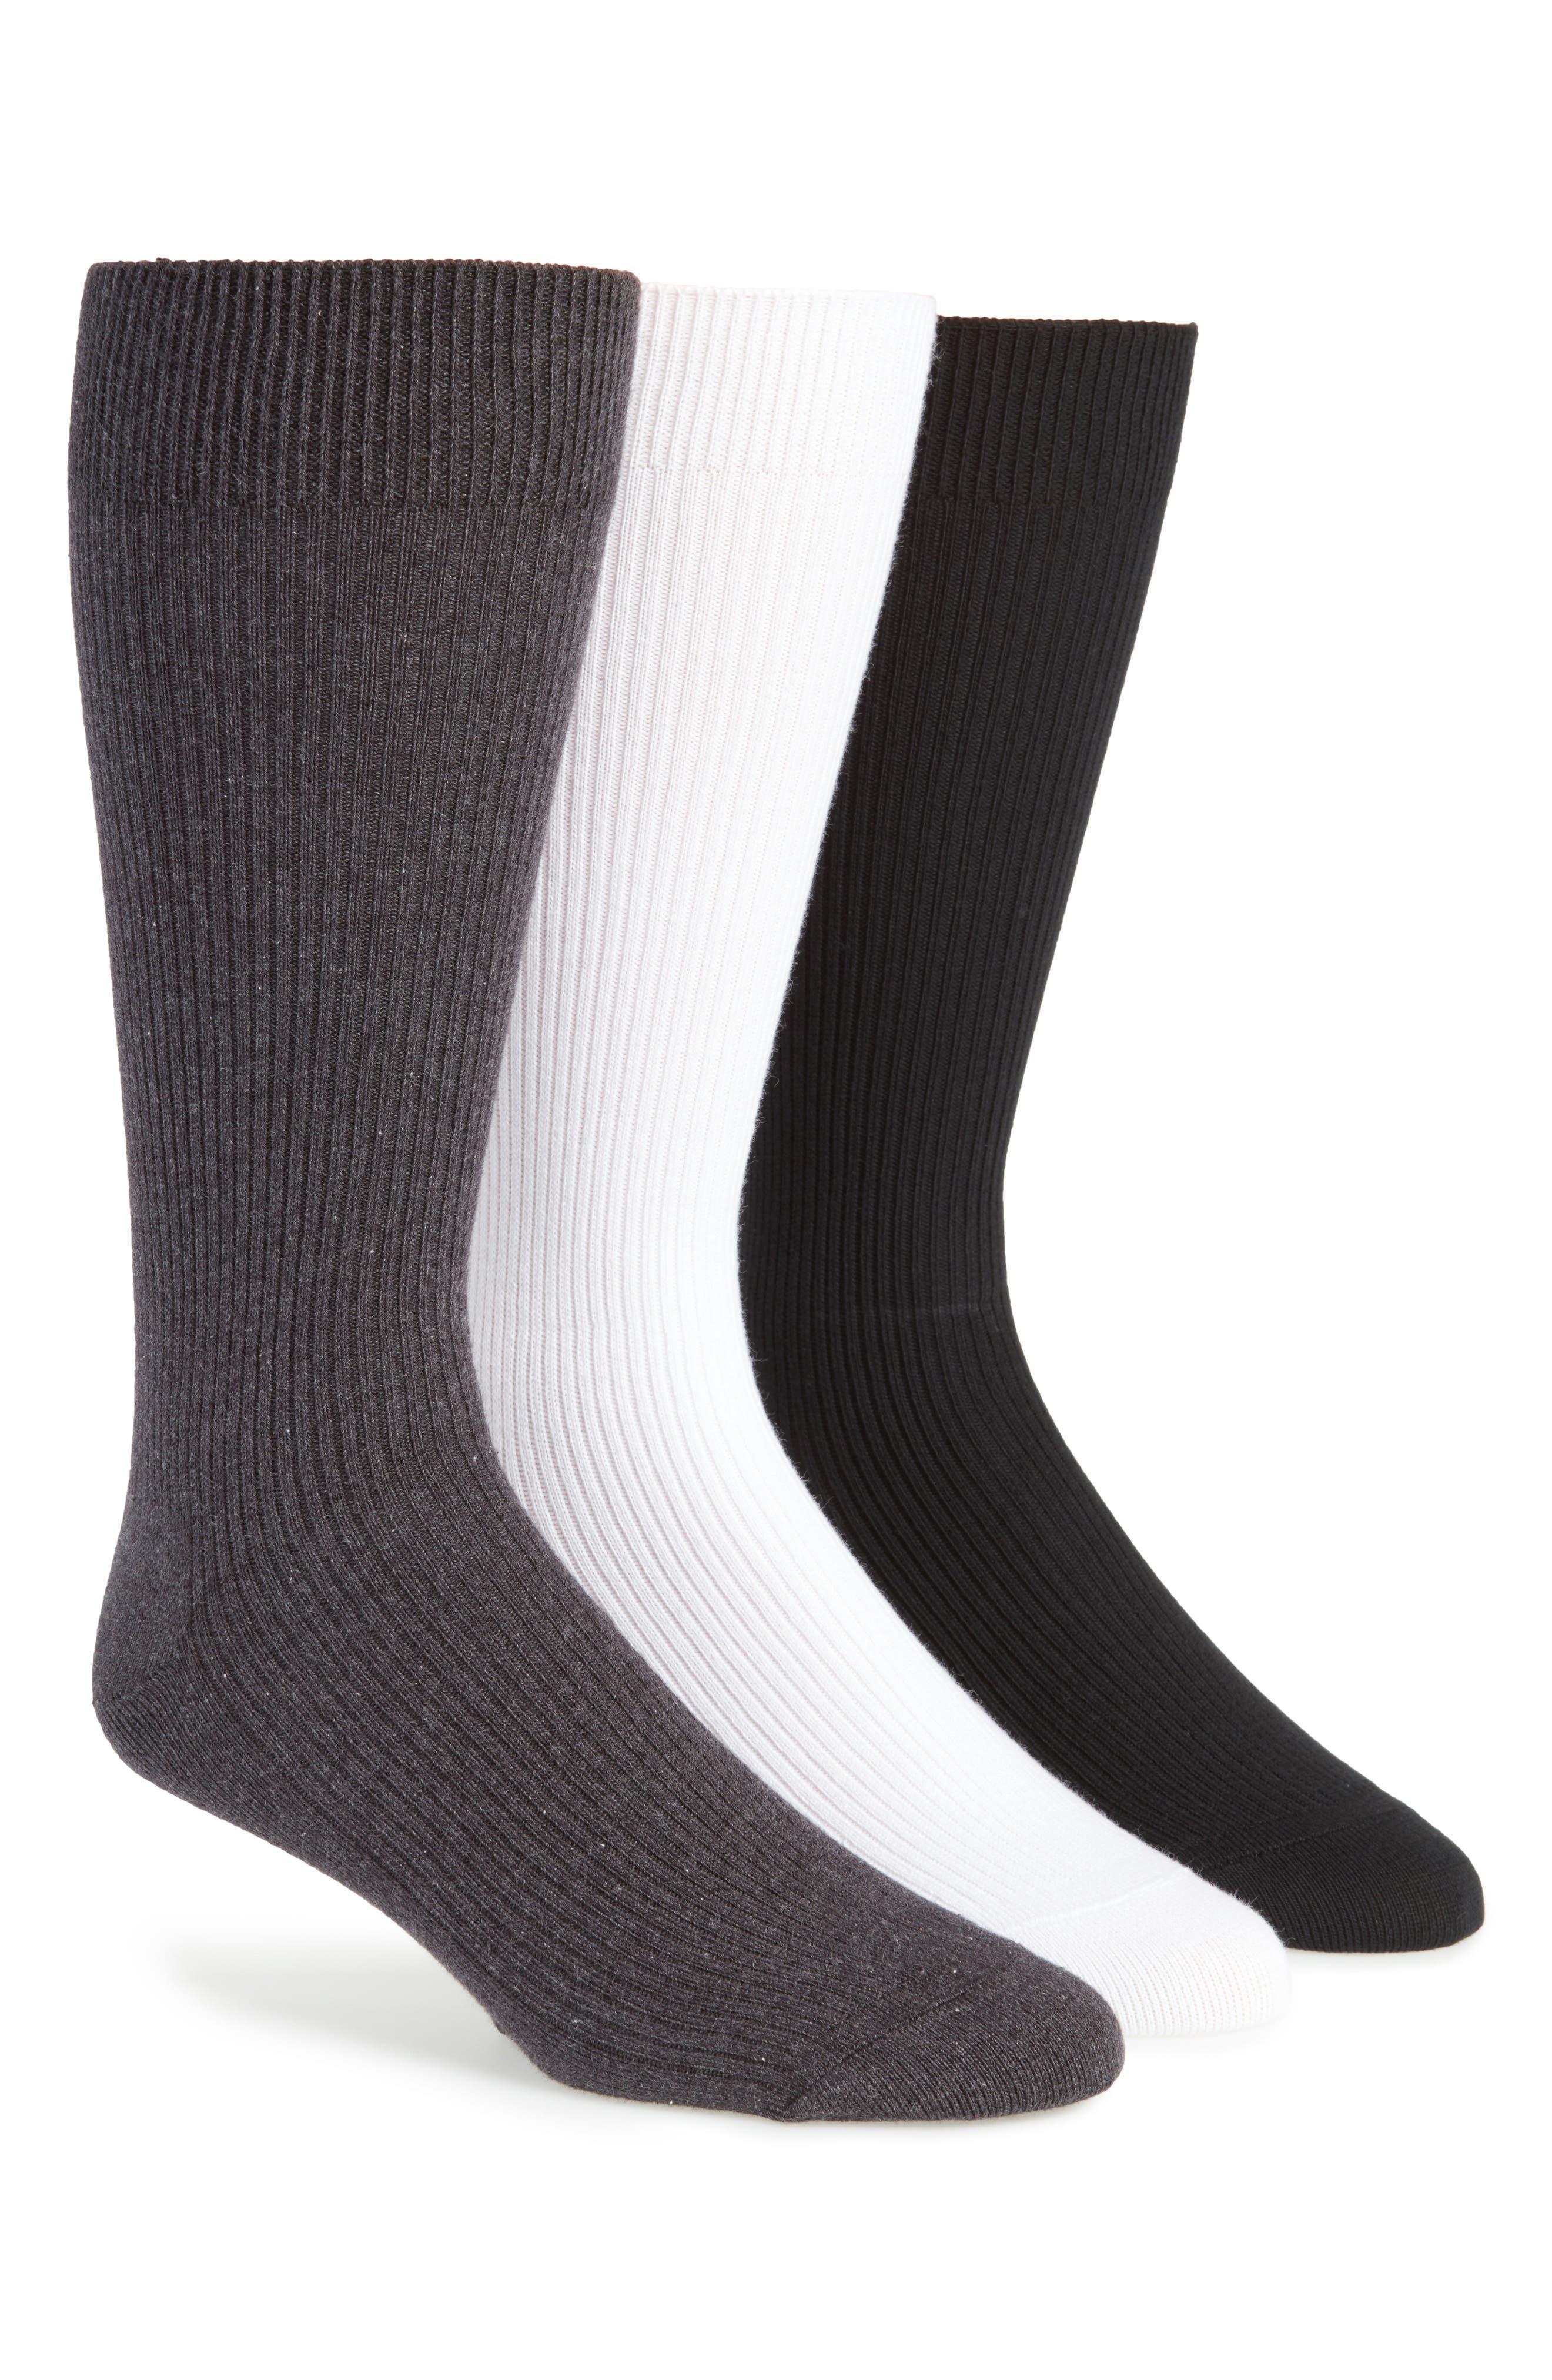 3-Pack Socks,                         Main,                         color,